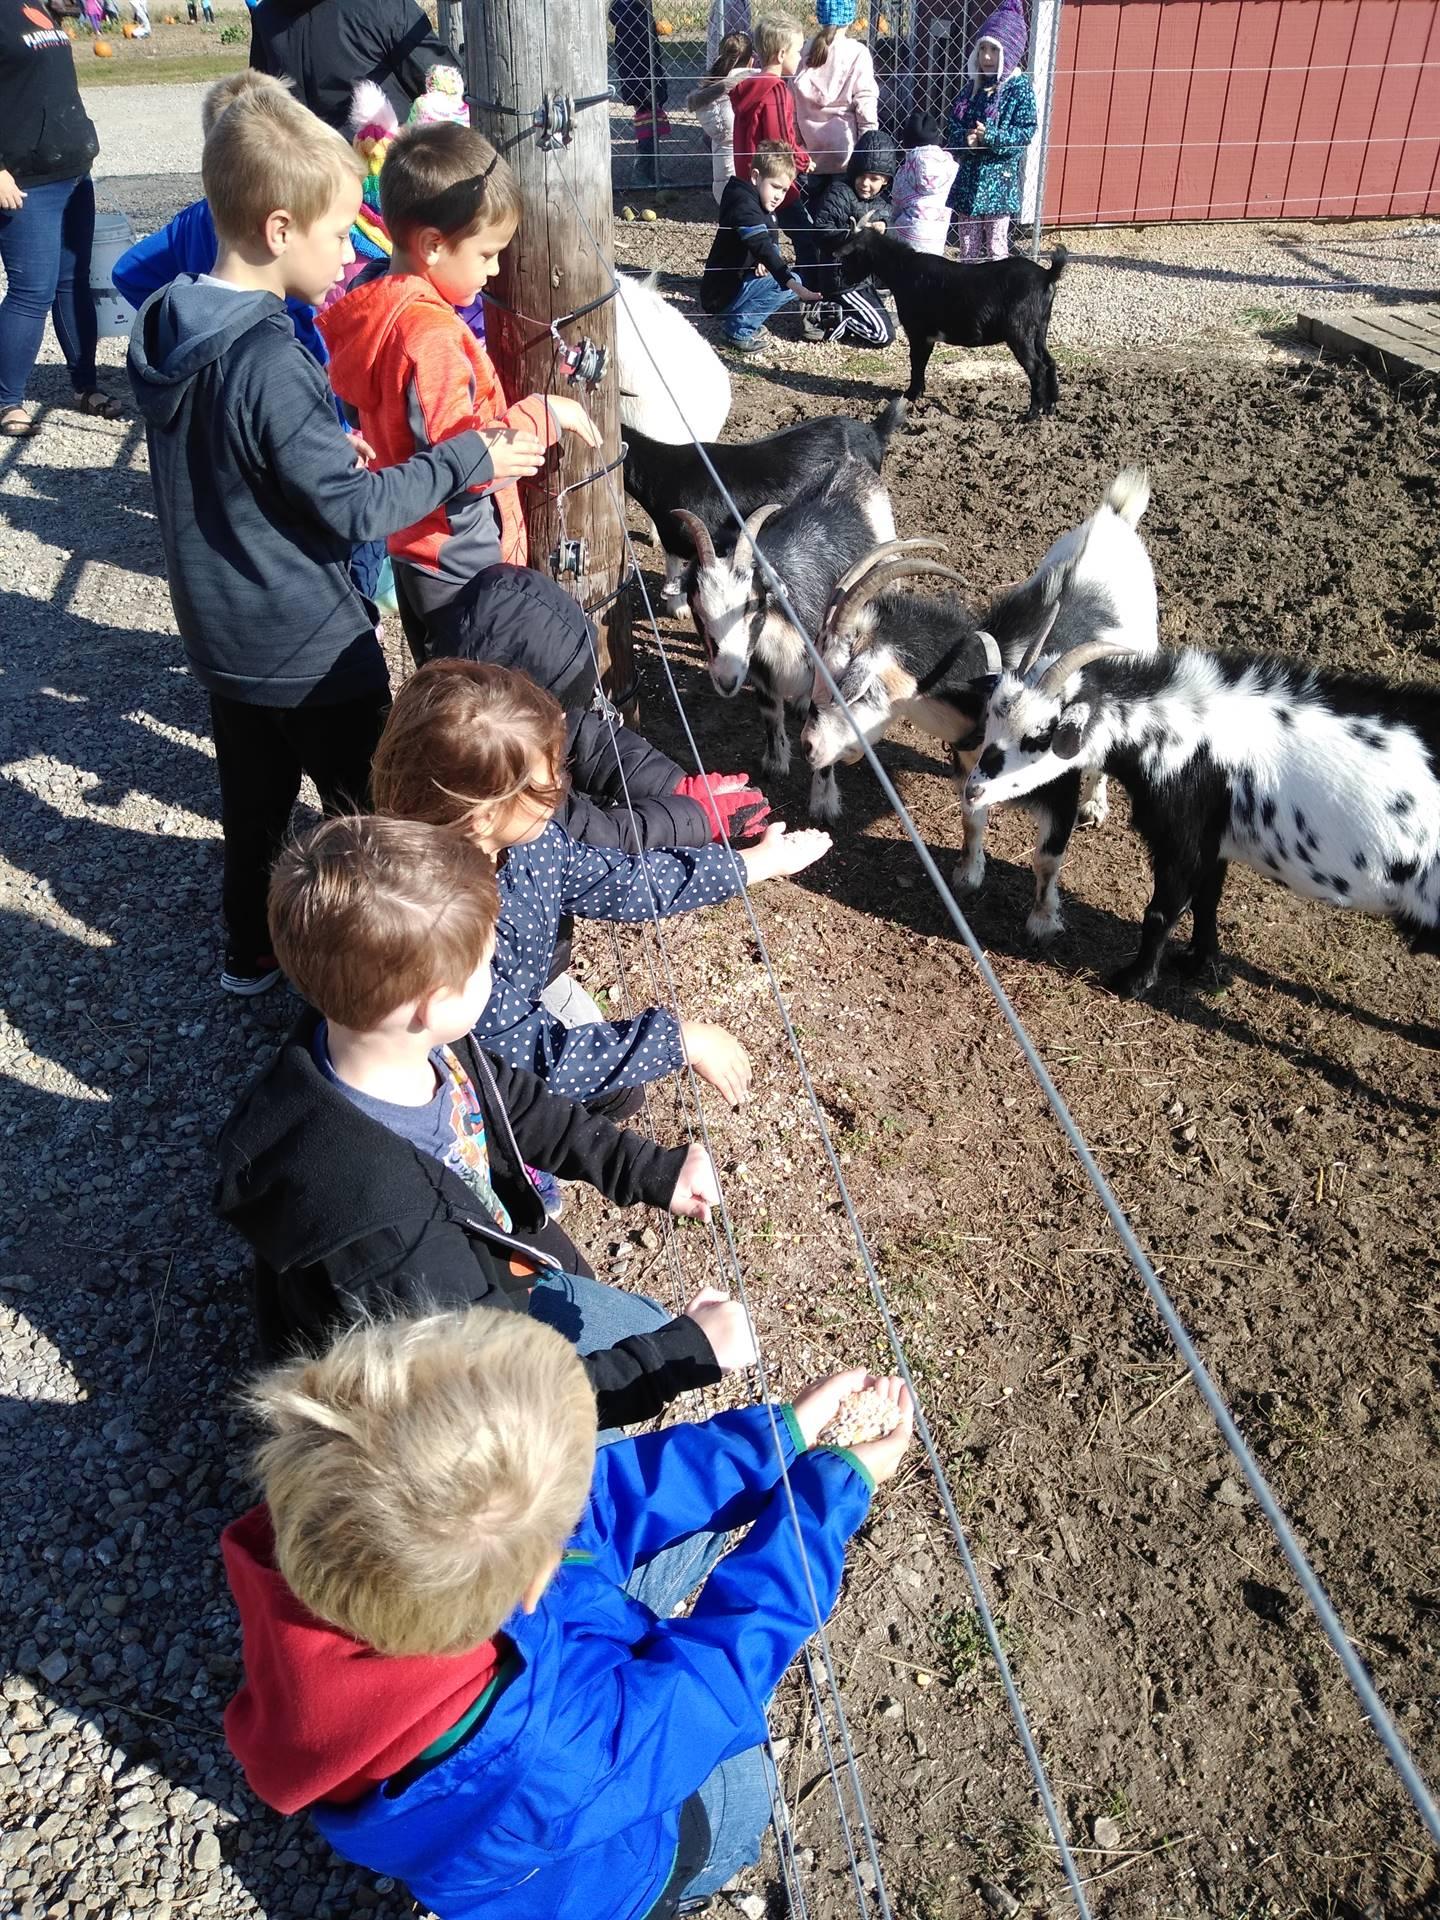 1st grade students feeding goats on a farm